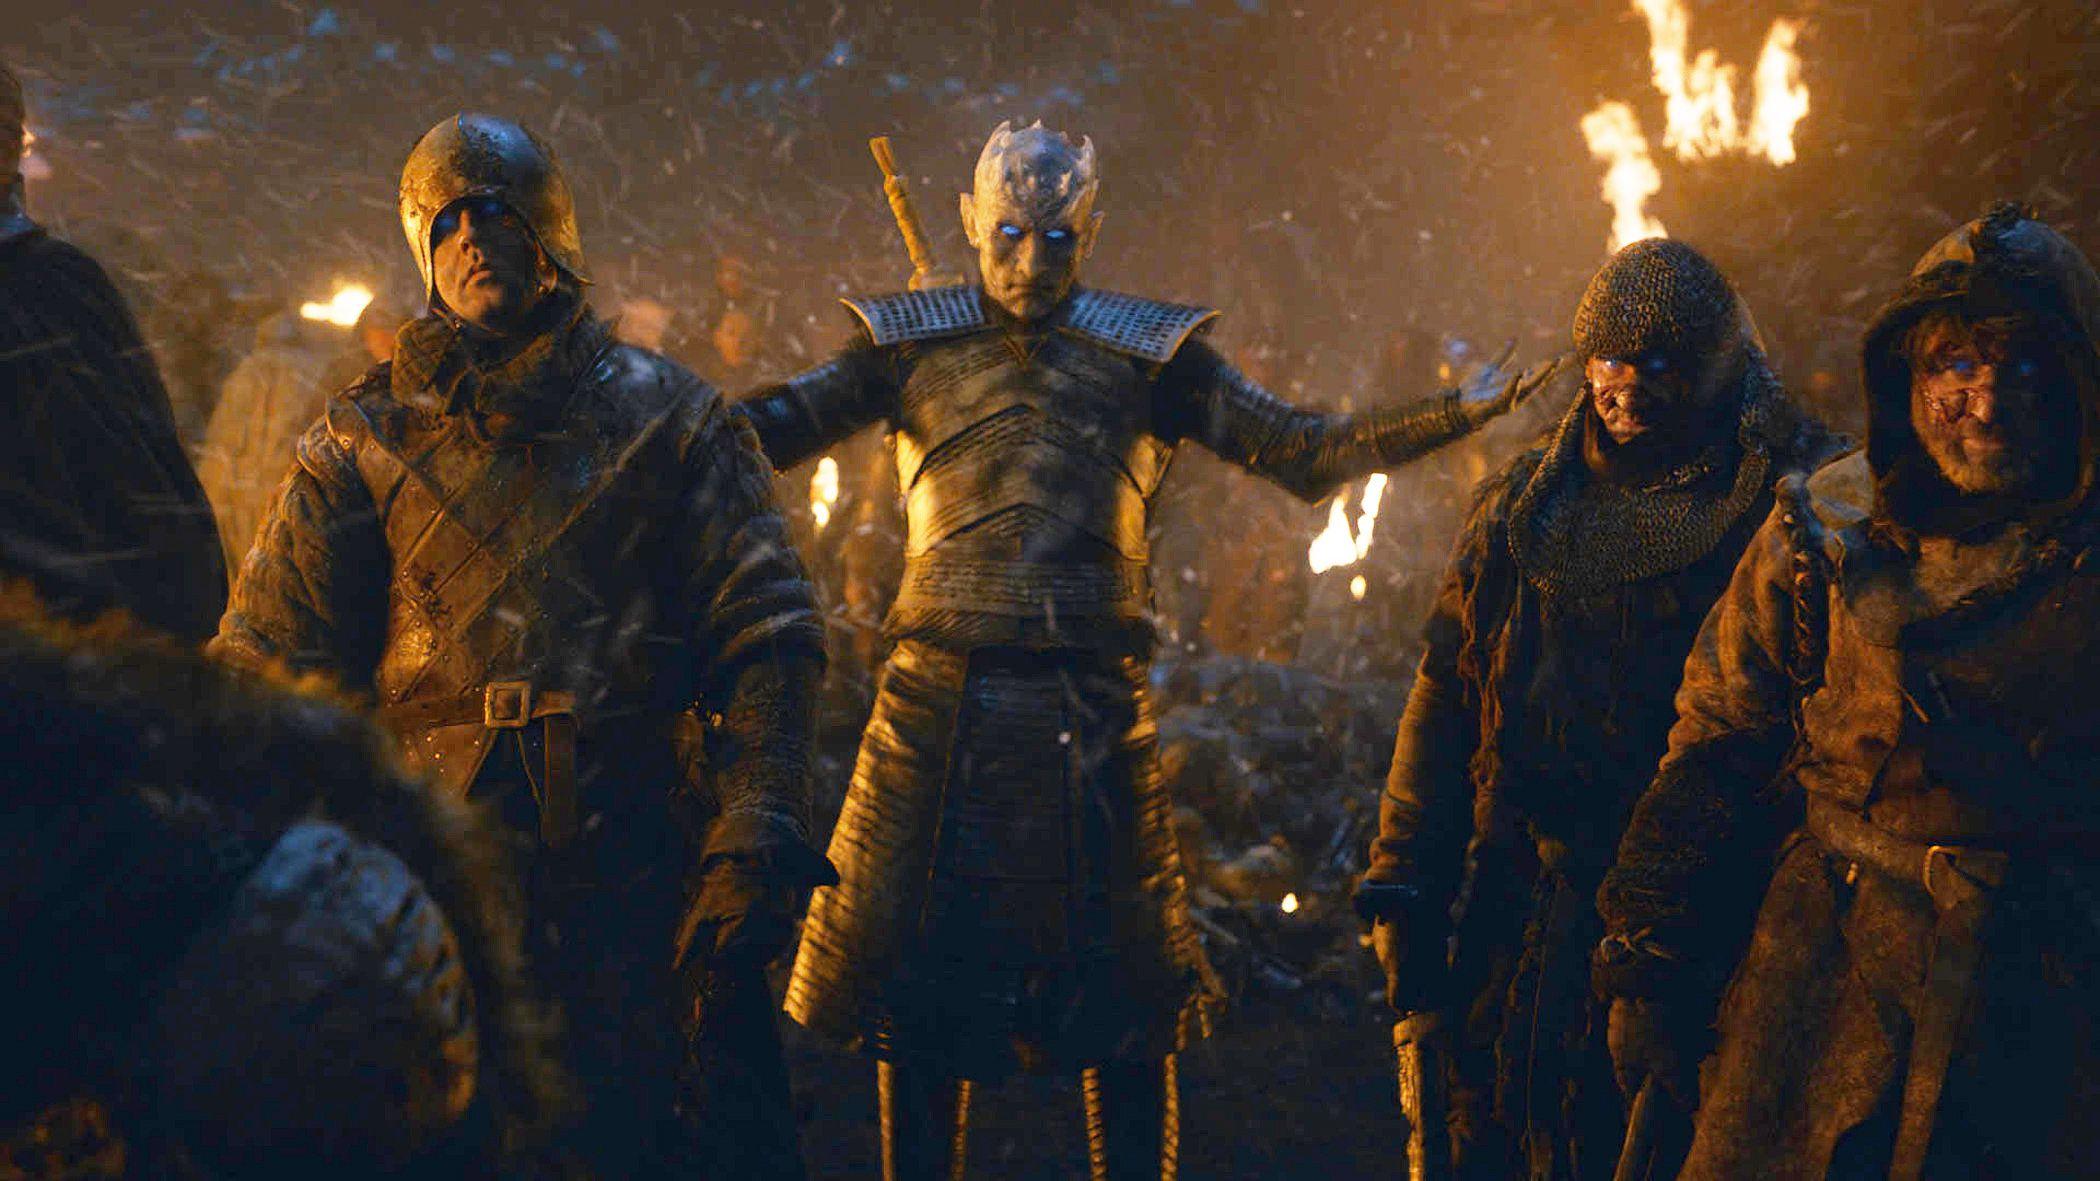 Game of Thrones s08 e03: Modrej Mojžíš dostal po čuni, taktika & strategie třikrát tolik